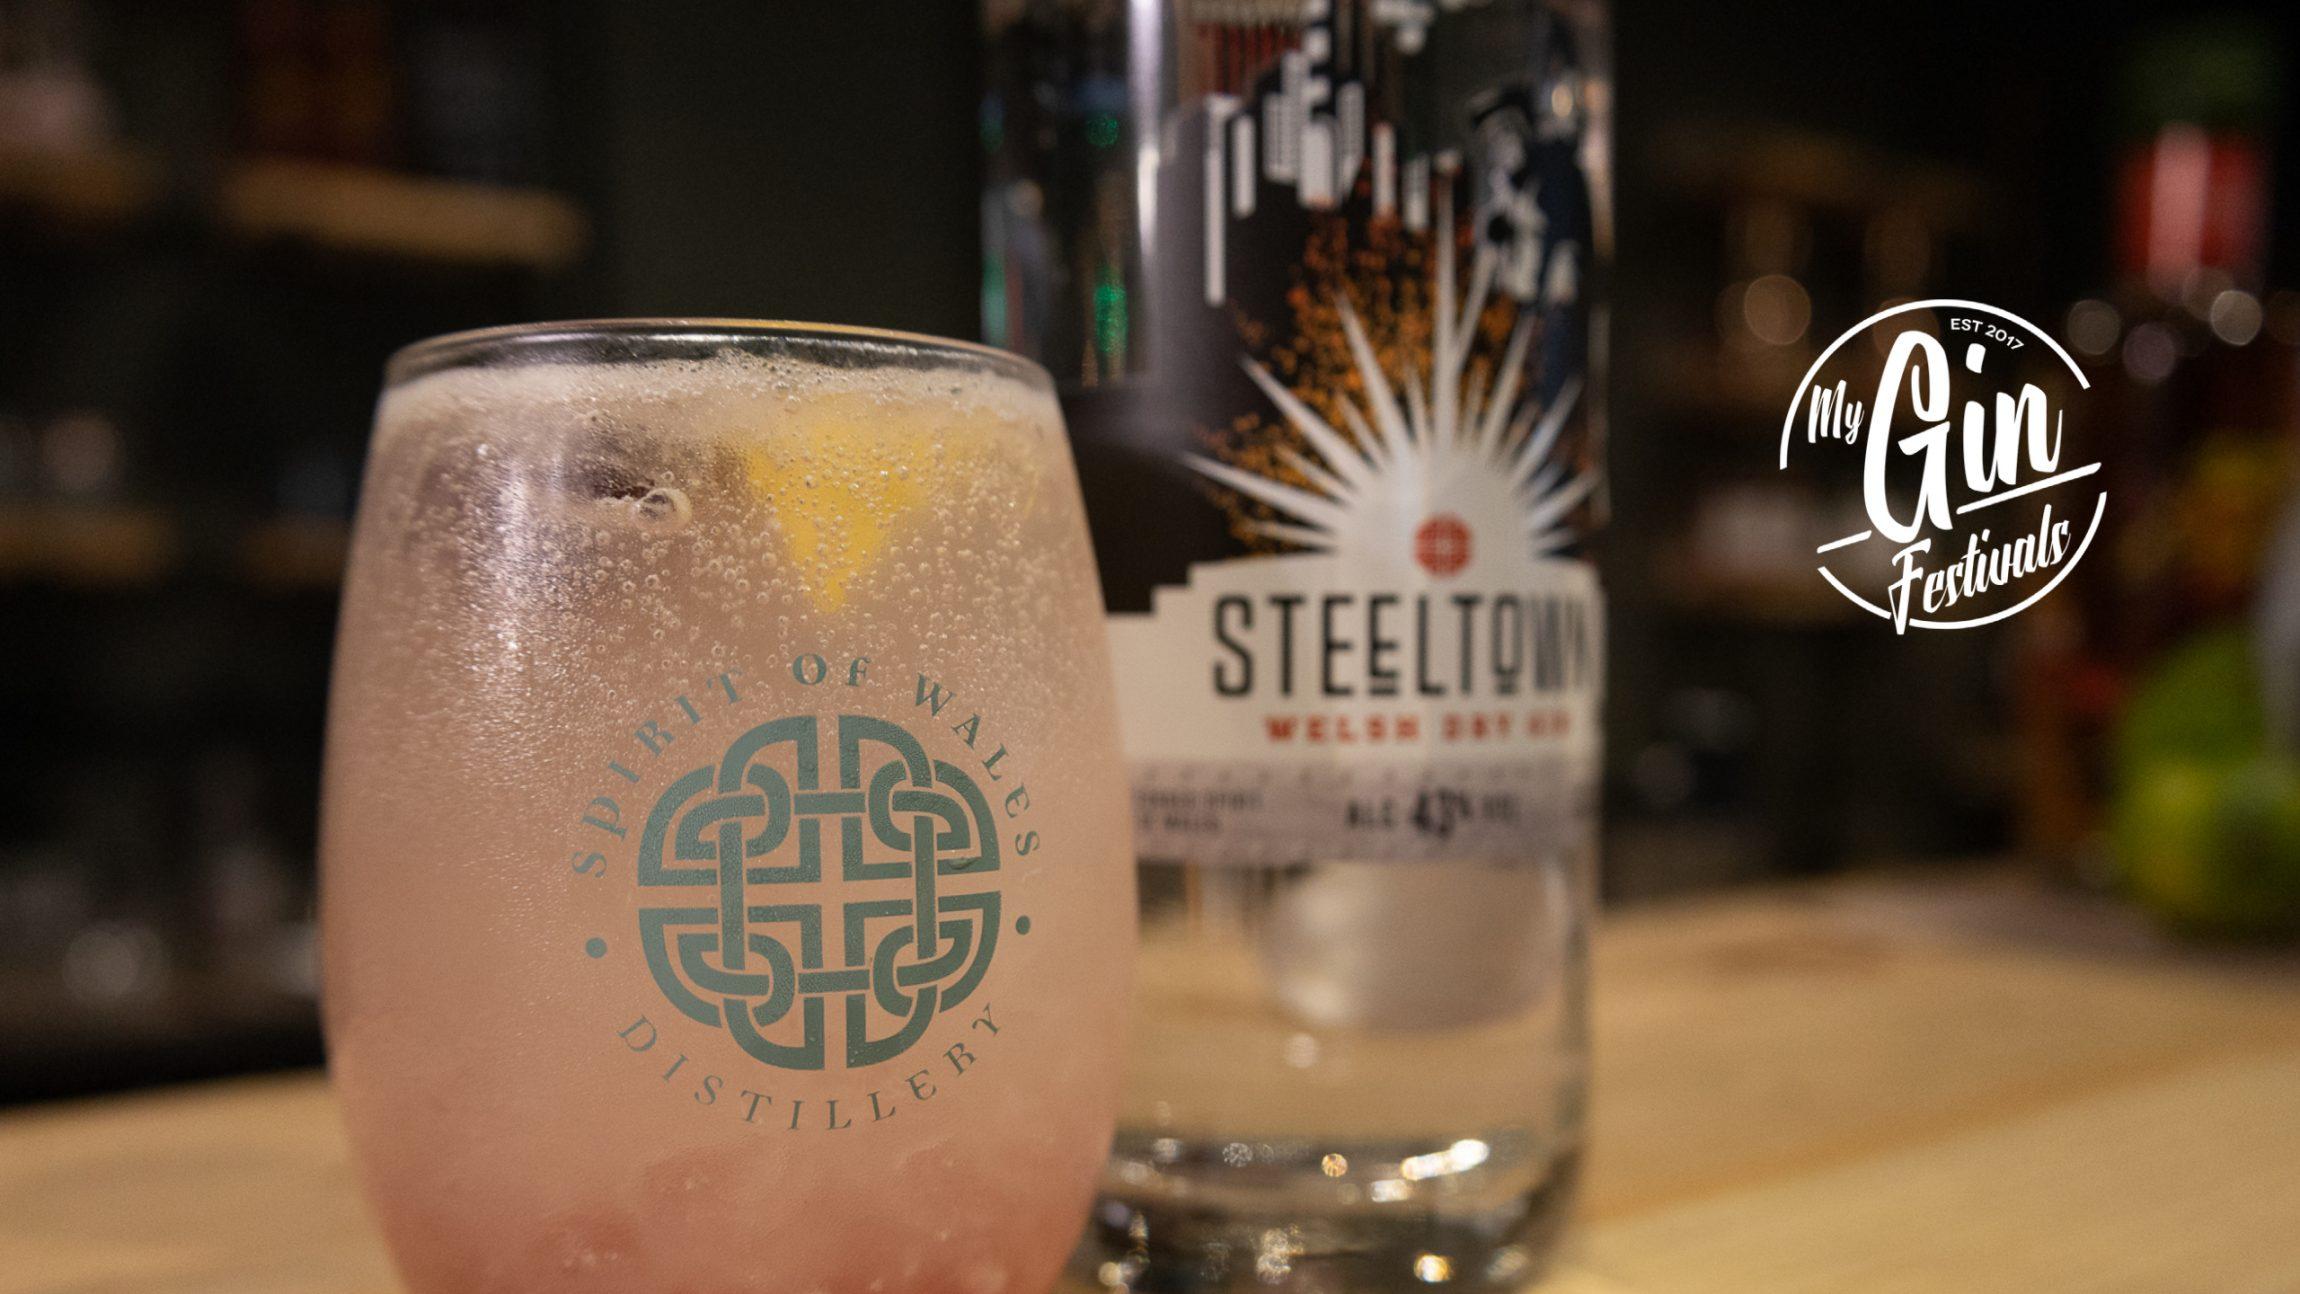 Spirit of Wales Distillery - Steeltown Welsh Gin - My Gin Festivals